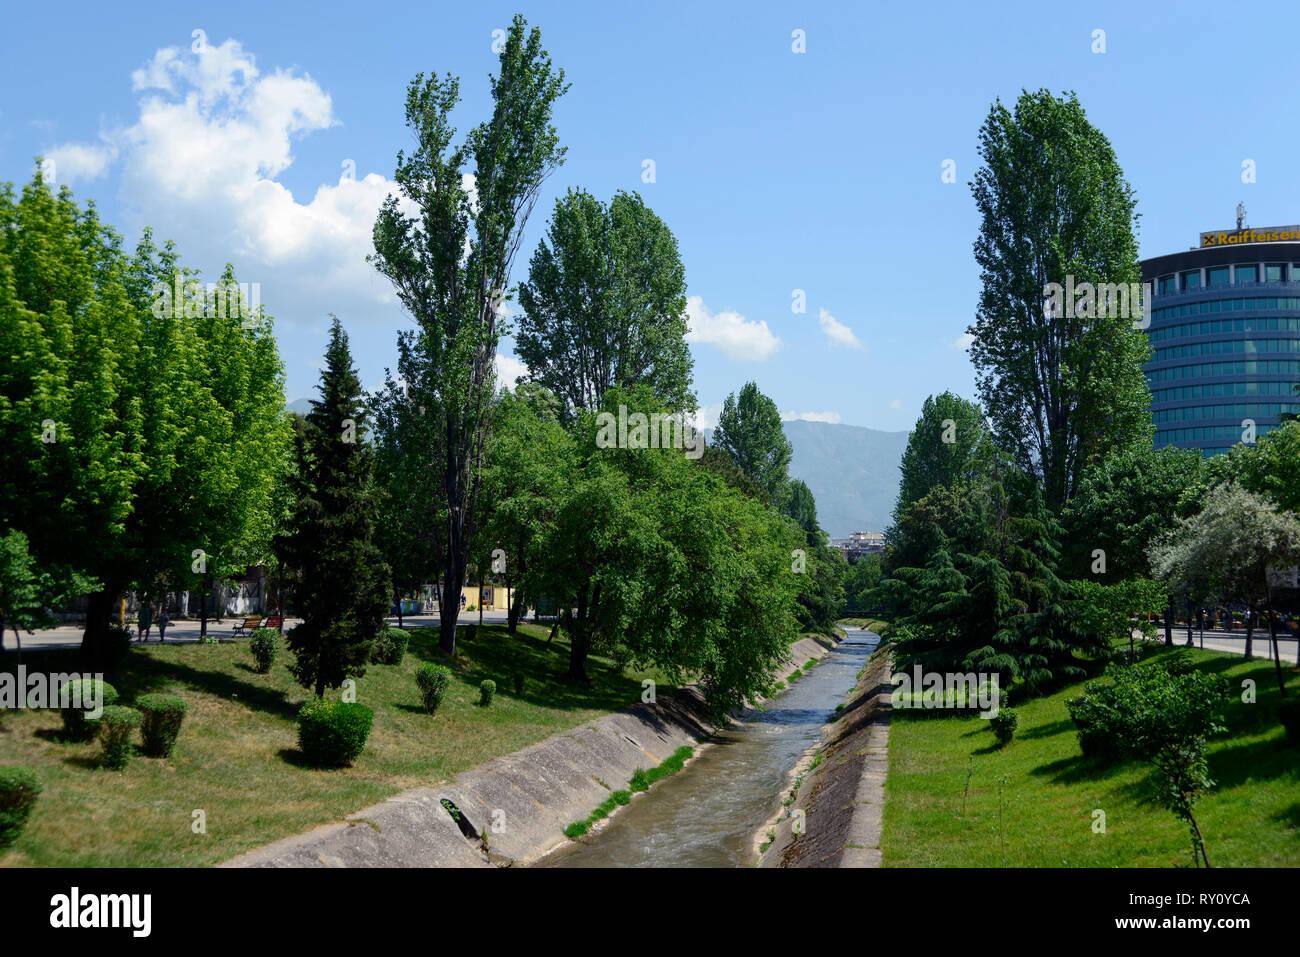 Park on Boulevard Bajram Curri, Downtown, Tirana, Albania - Stock Image